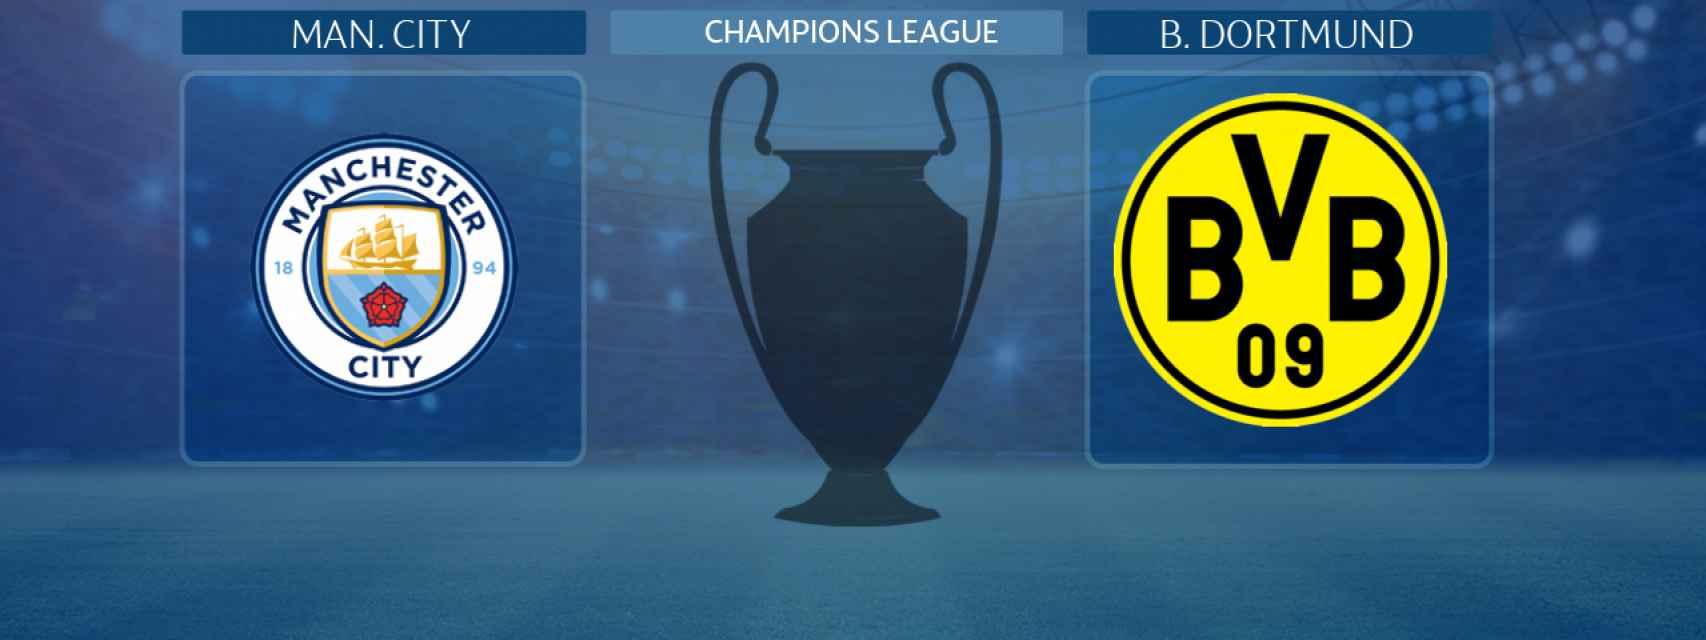 Manchester City - Borussia Dortmund, partido de la Champions League